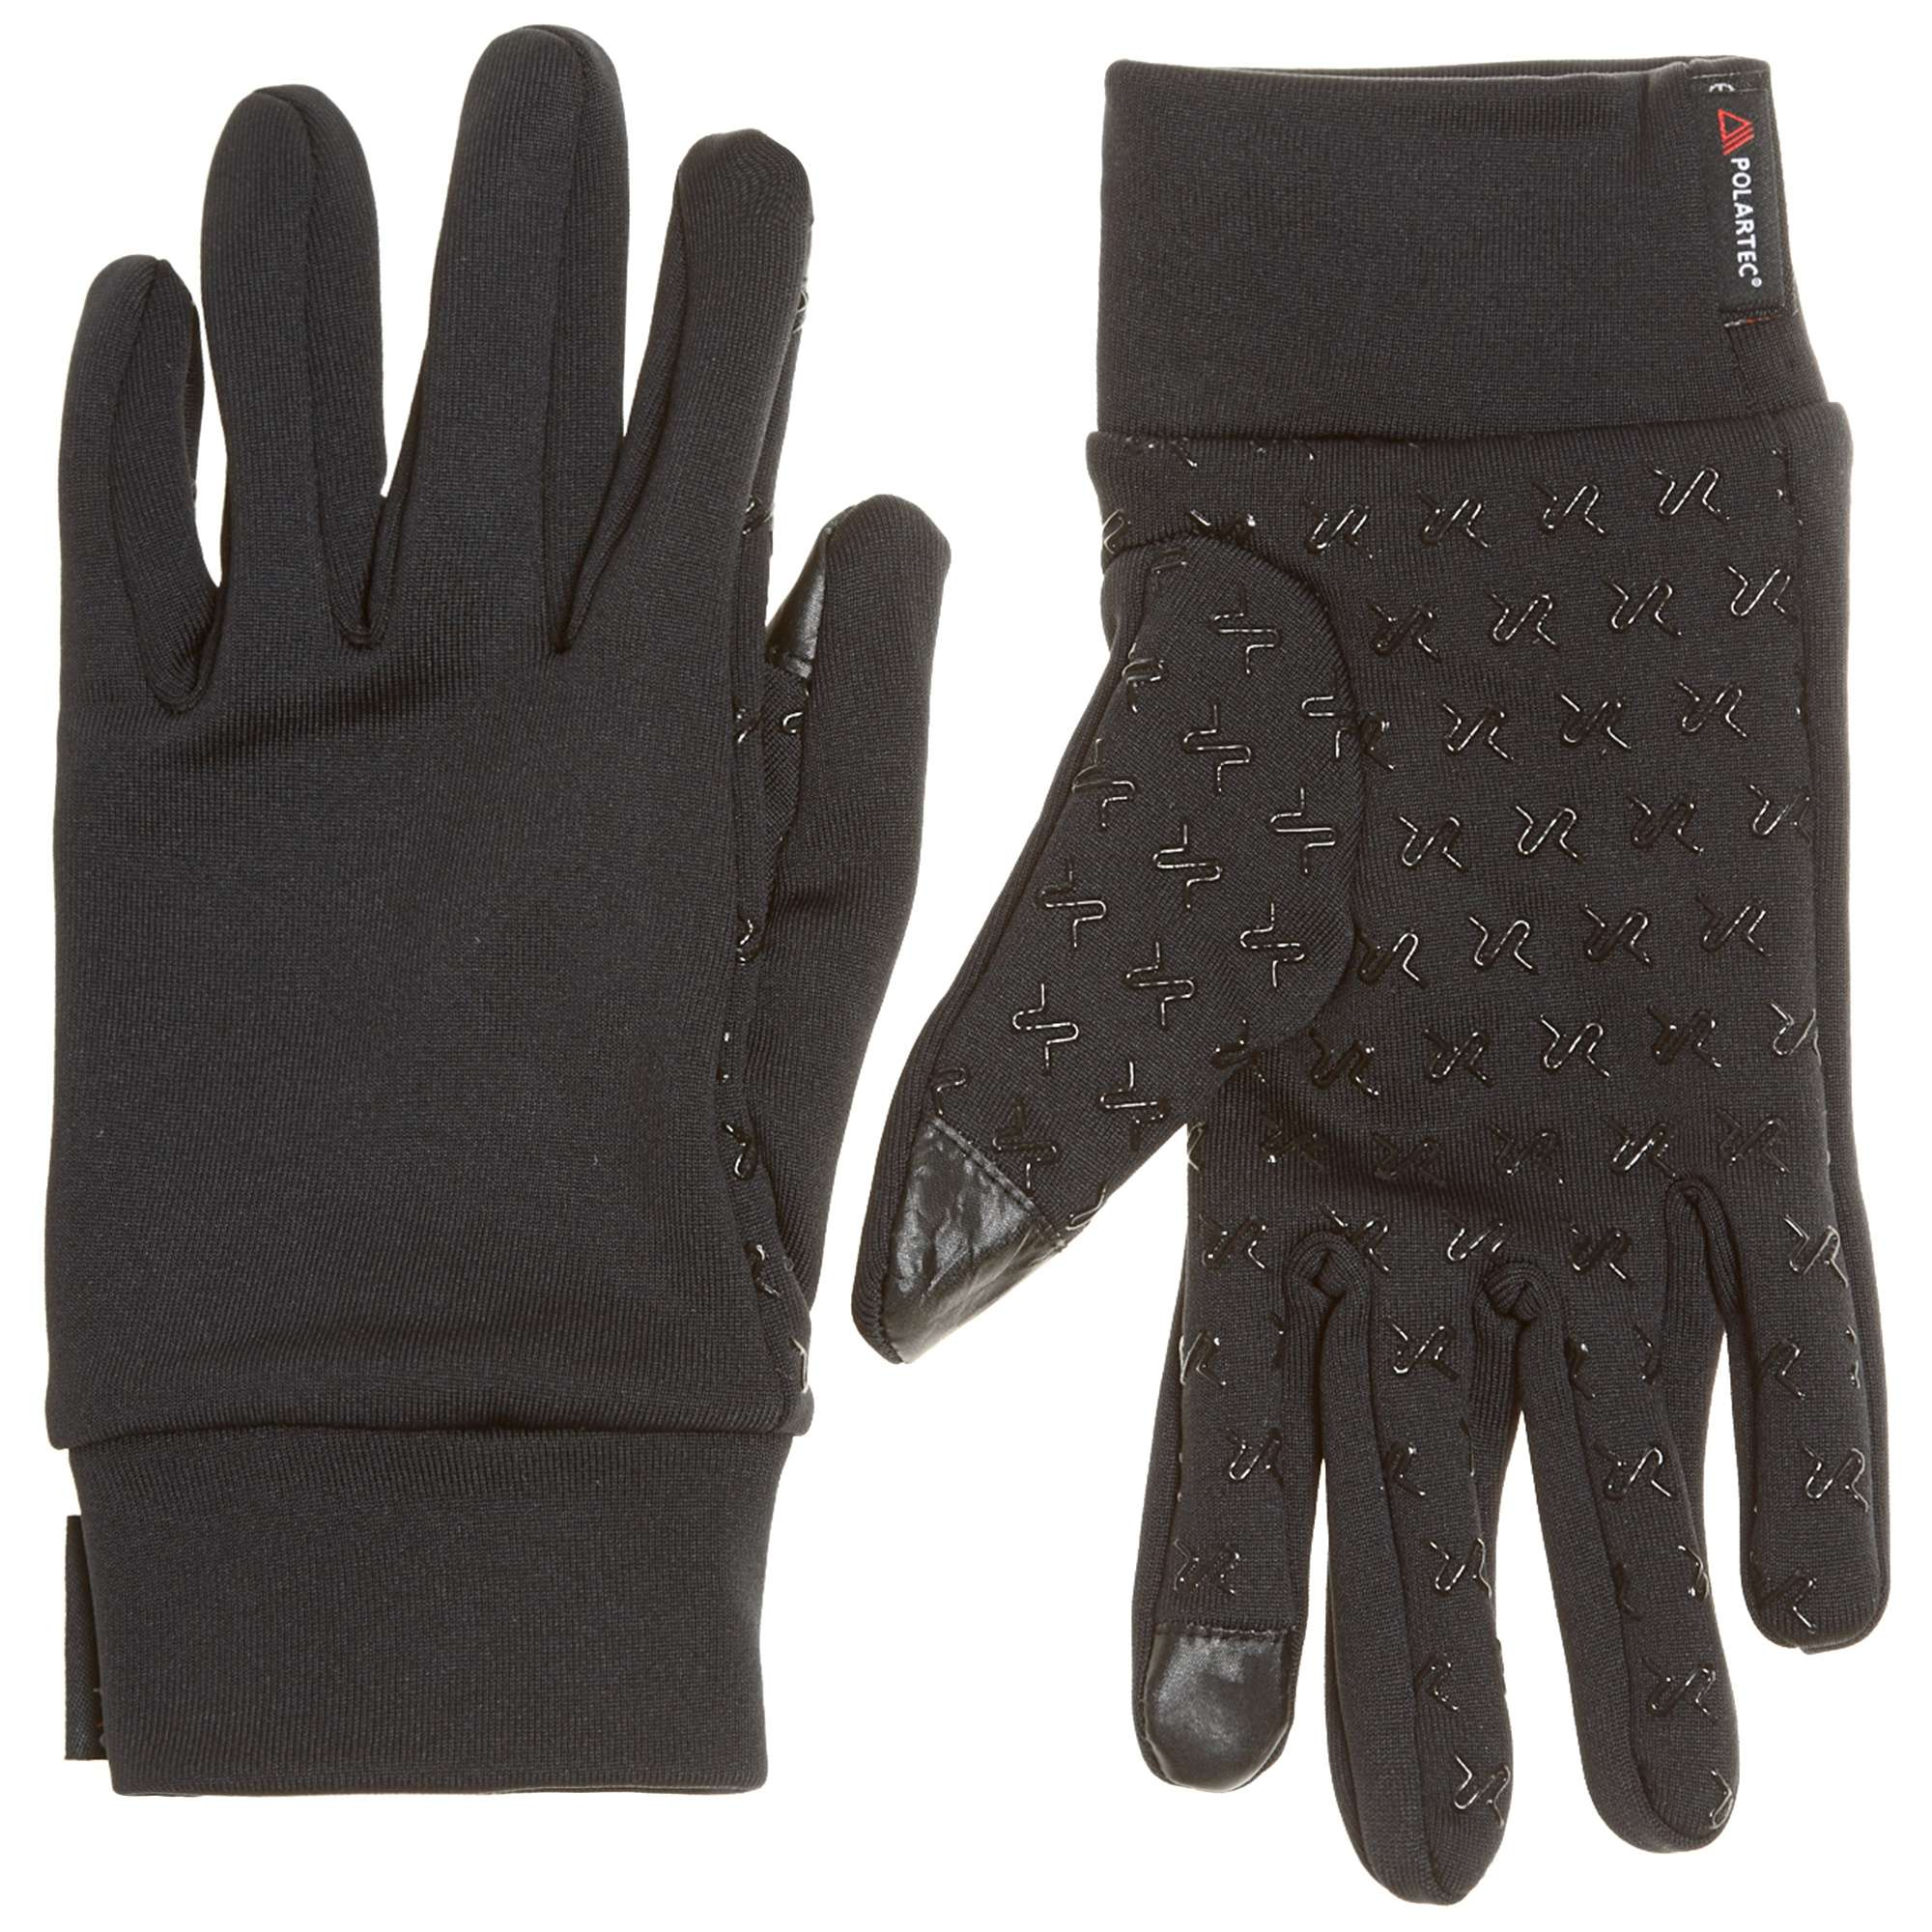 EXTREMITIES Sticky POWERSTRETCH® Gloves